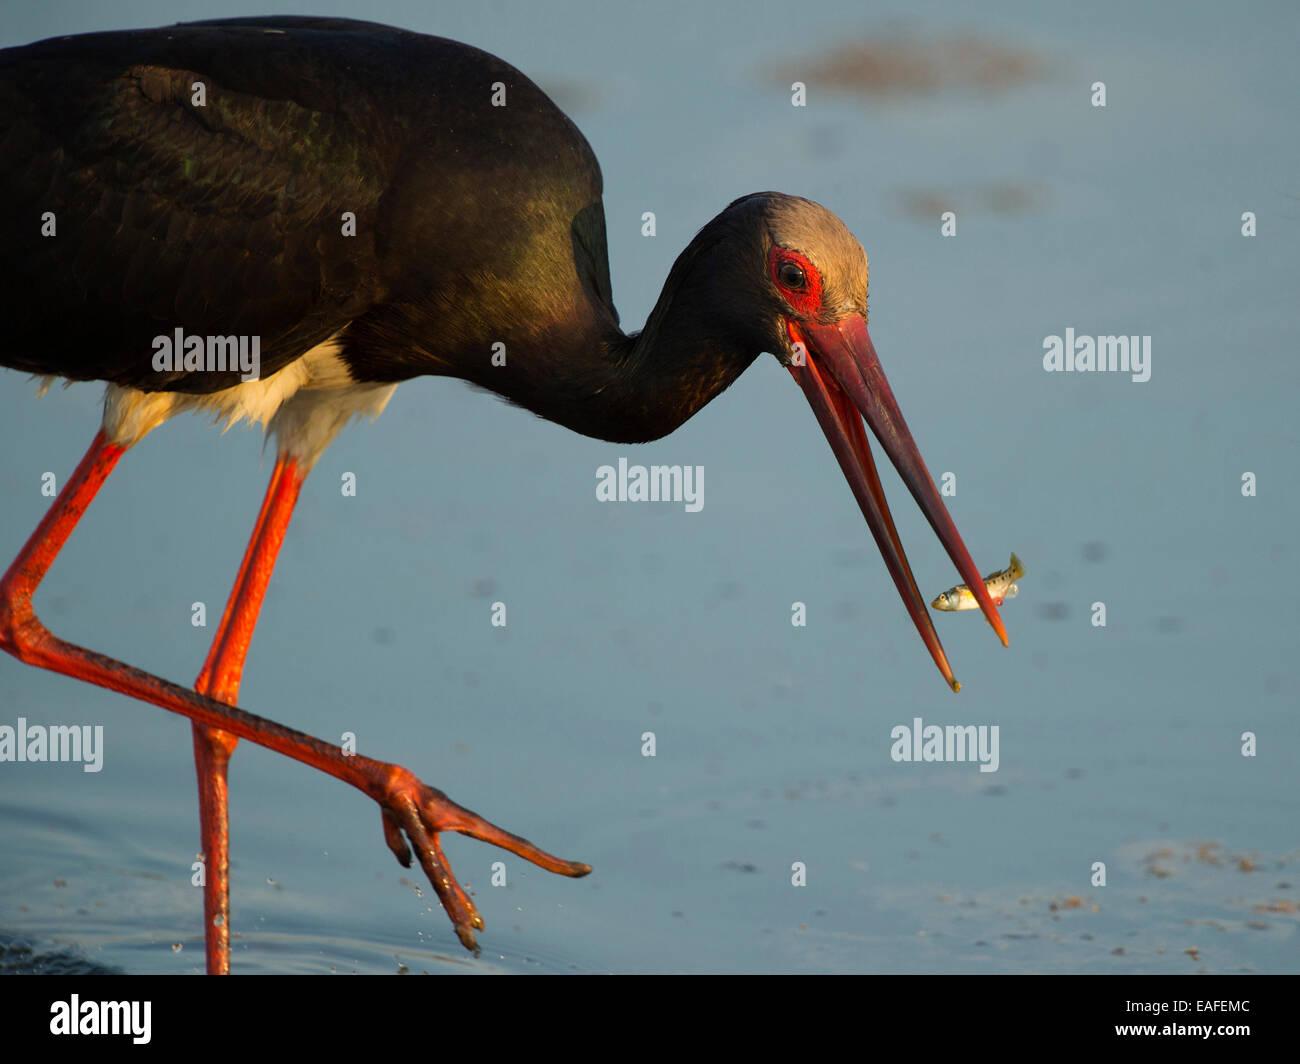 black stork, ciconia nigra, germany, europe - Stock Image